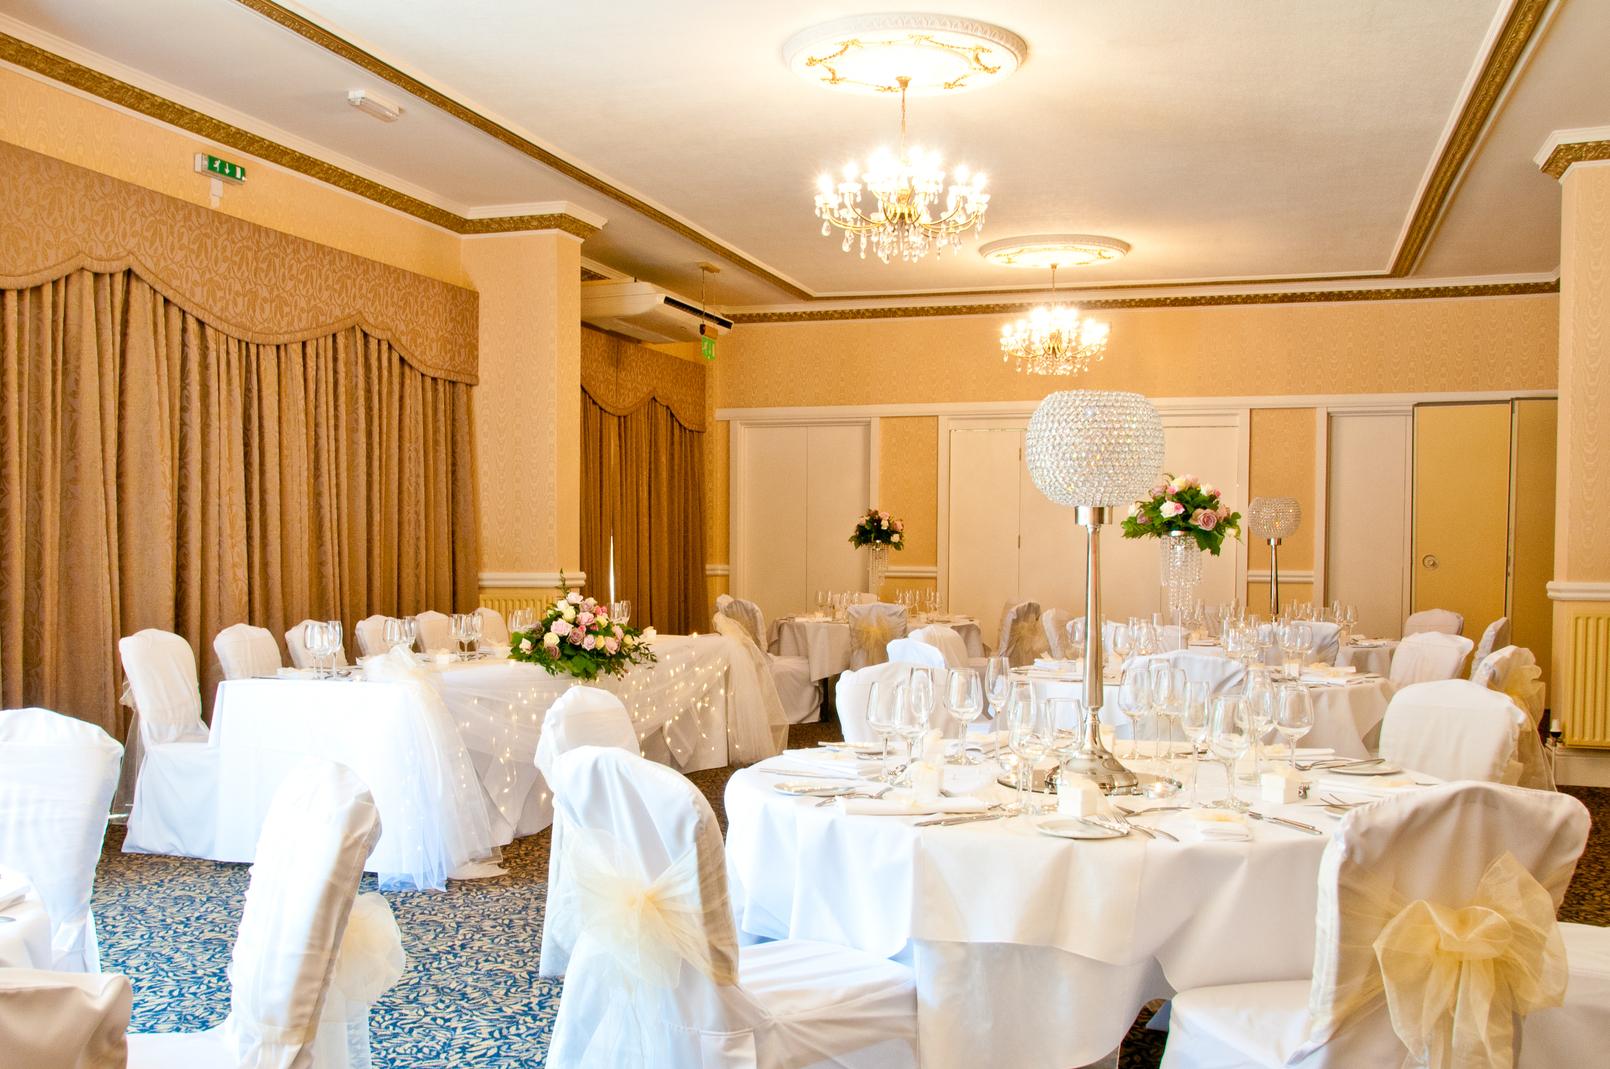 best western grimsby oaklands hall hotel